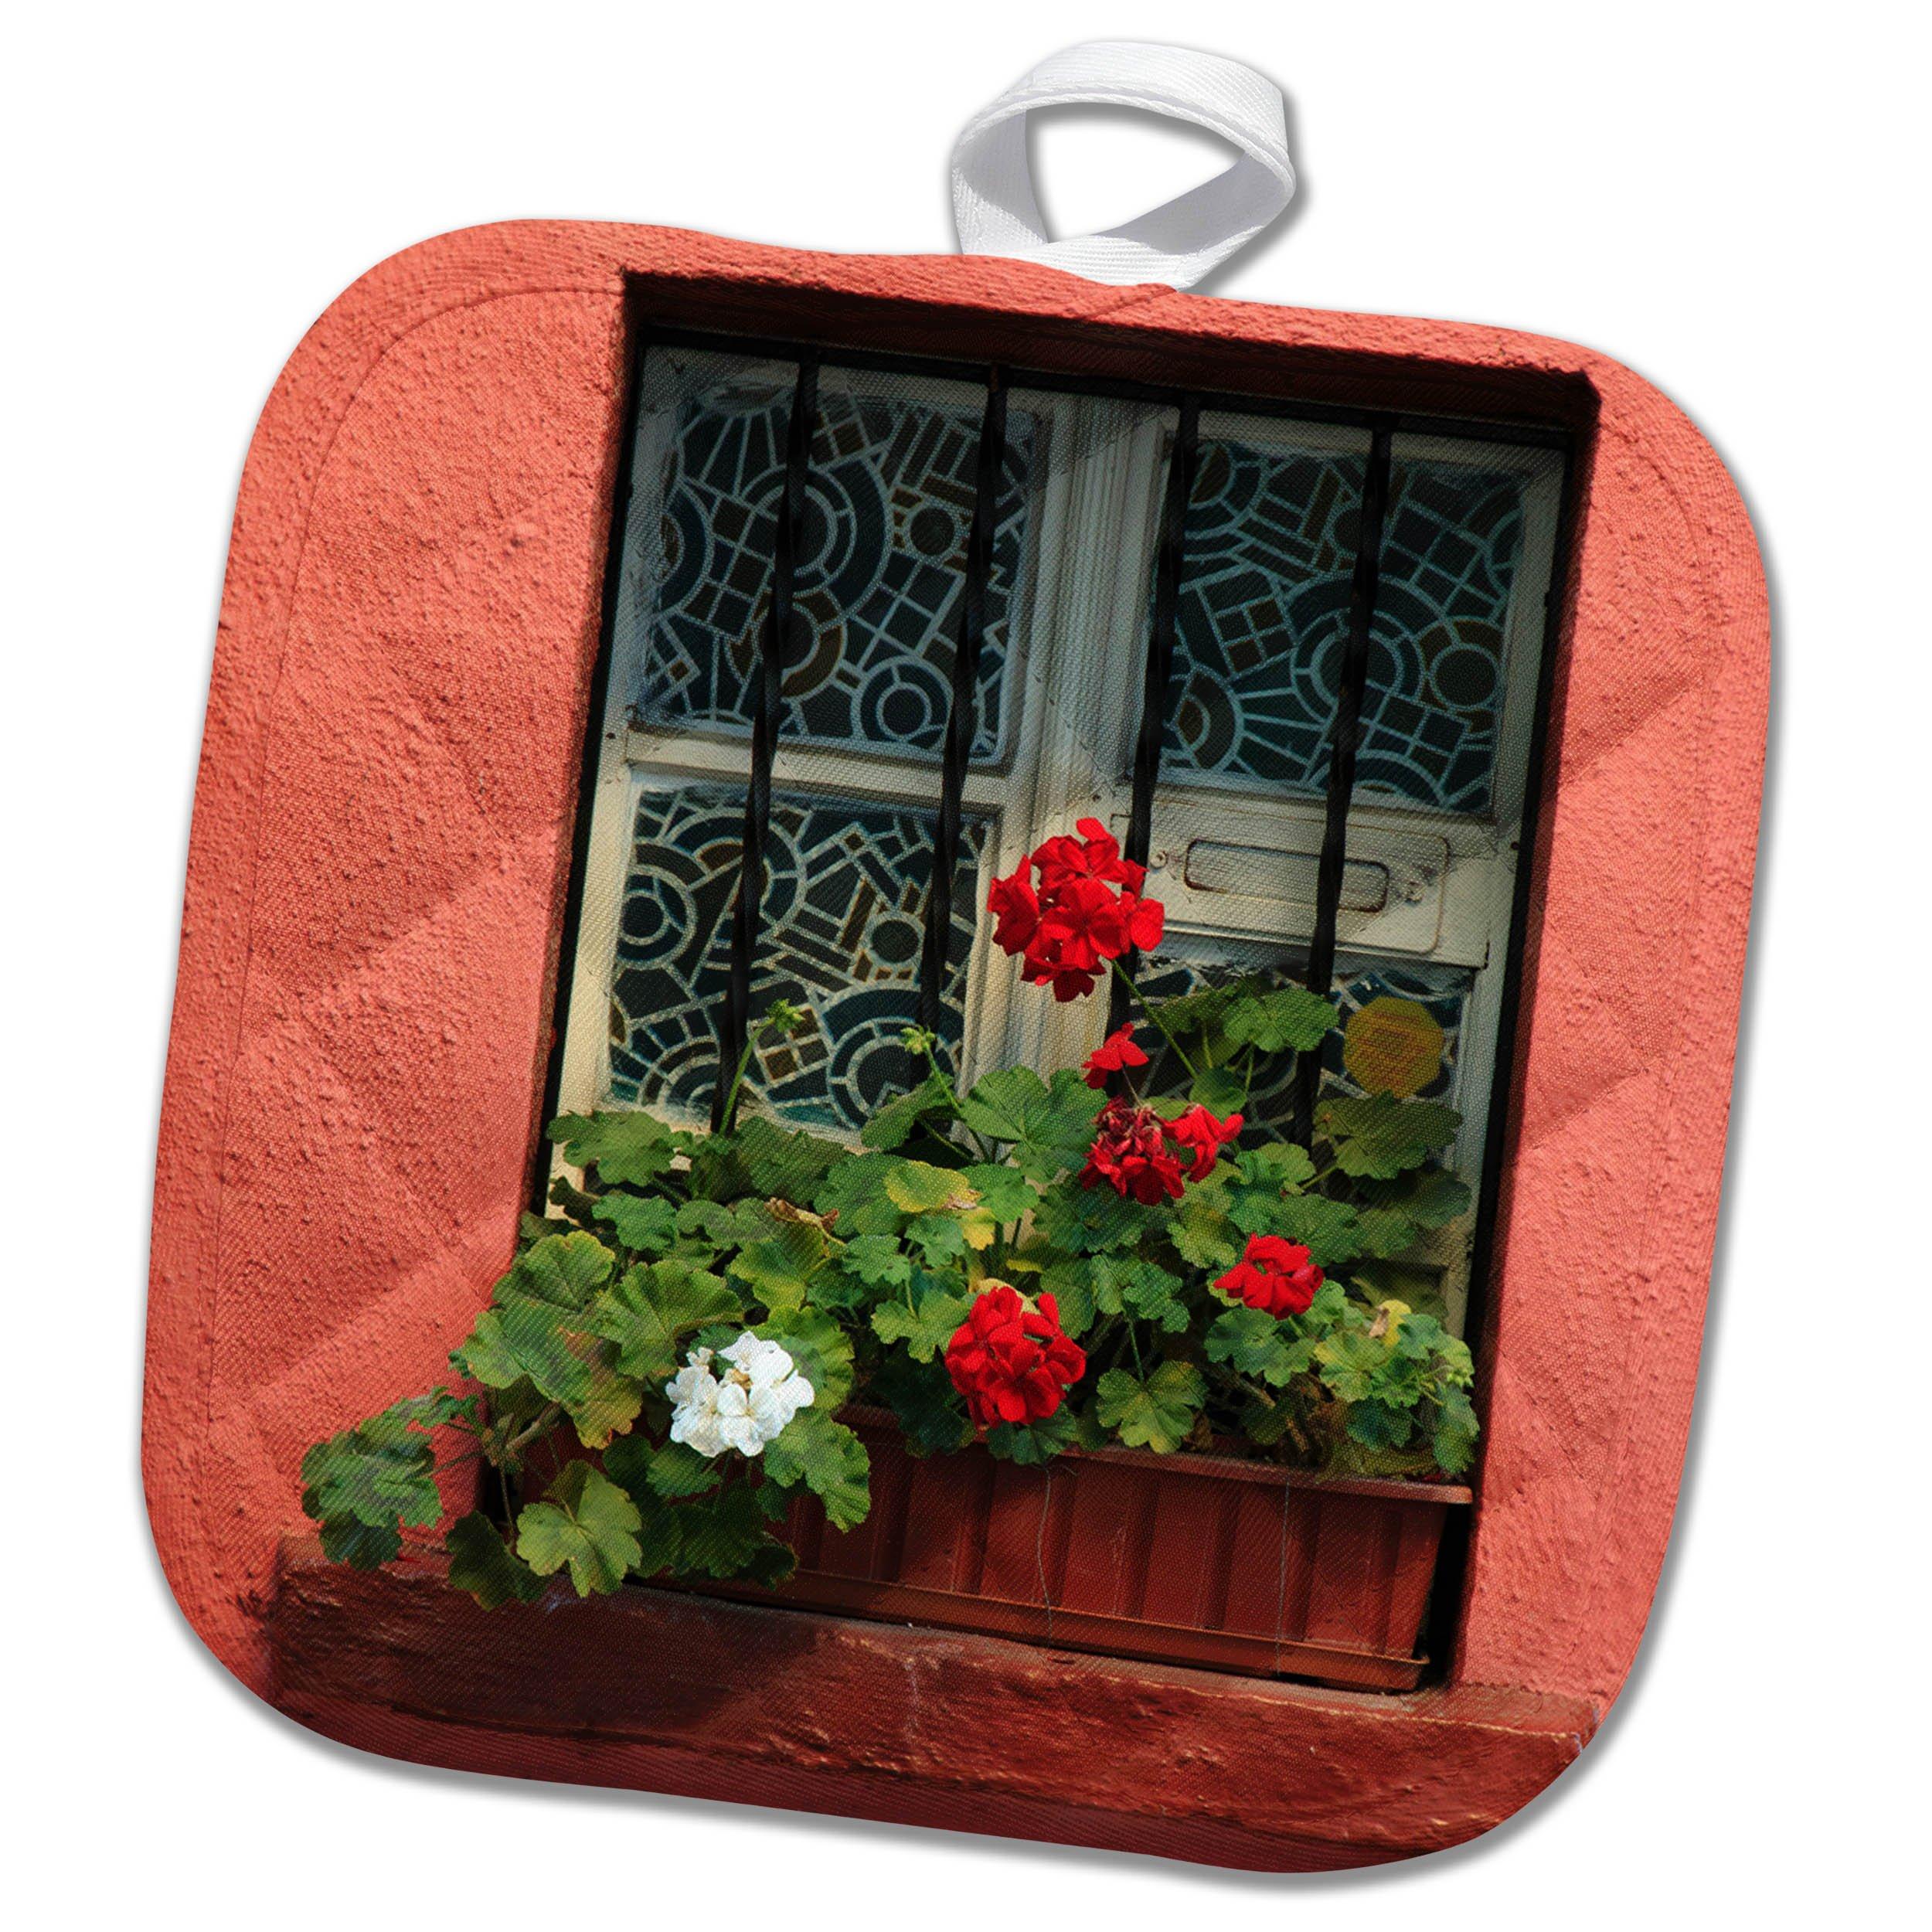 3dRose Danita Delimont - Flowers - Romania, Sighisoara, residential window in old town. Flowers in window - 8x8 Potholder (phl_277872_1)